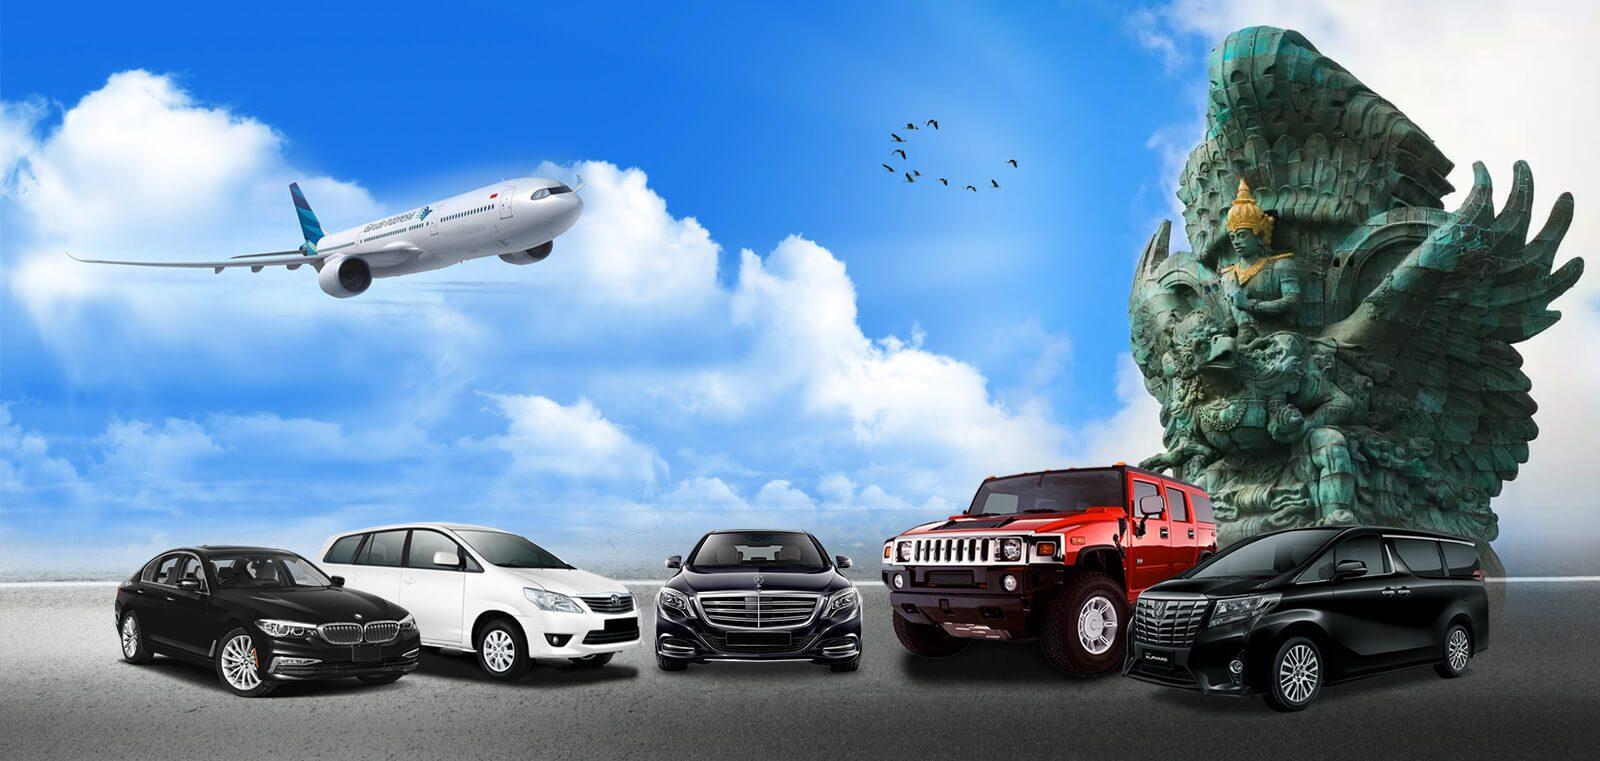 Bali Midori - Bali Airport Transfers, Bali Shuttle, Bali Tours & Drivers